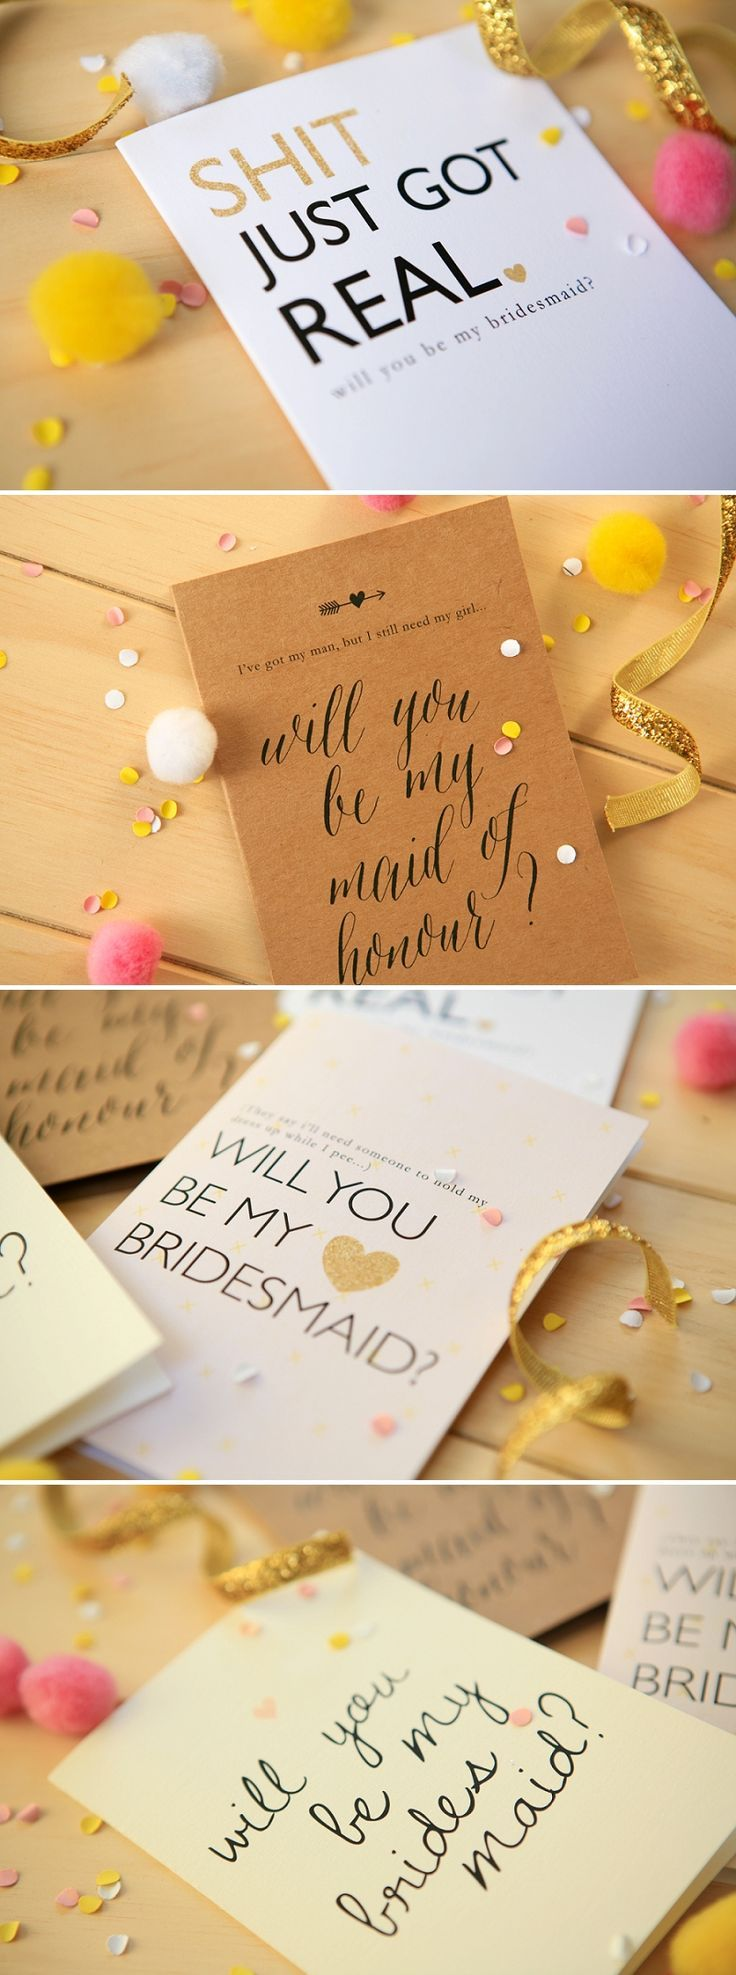 FREE Will you be my bridesmaid printables (scheduled via http://www.tailwindapp.com?utm_source=pinterest&utm_medium=twpin&utm_content=post23575512&utm_campaign=scheduler_attribution)